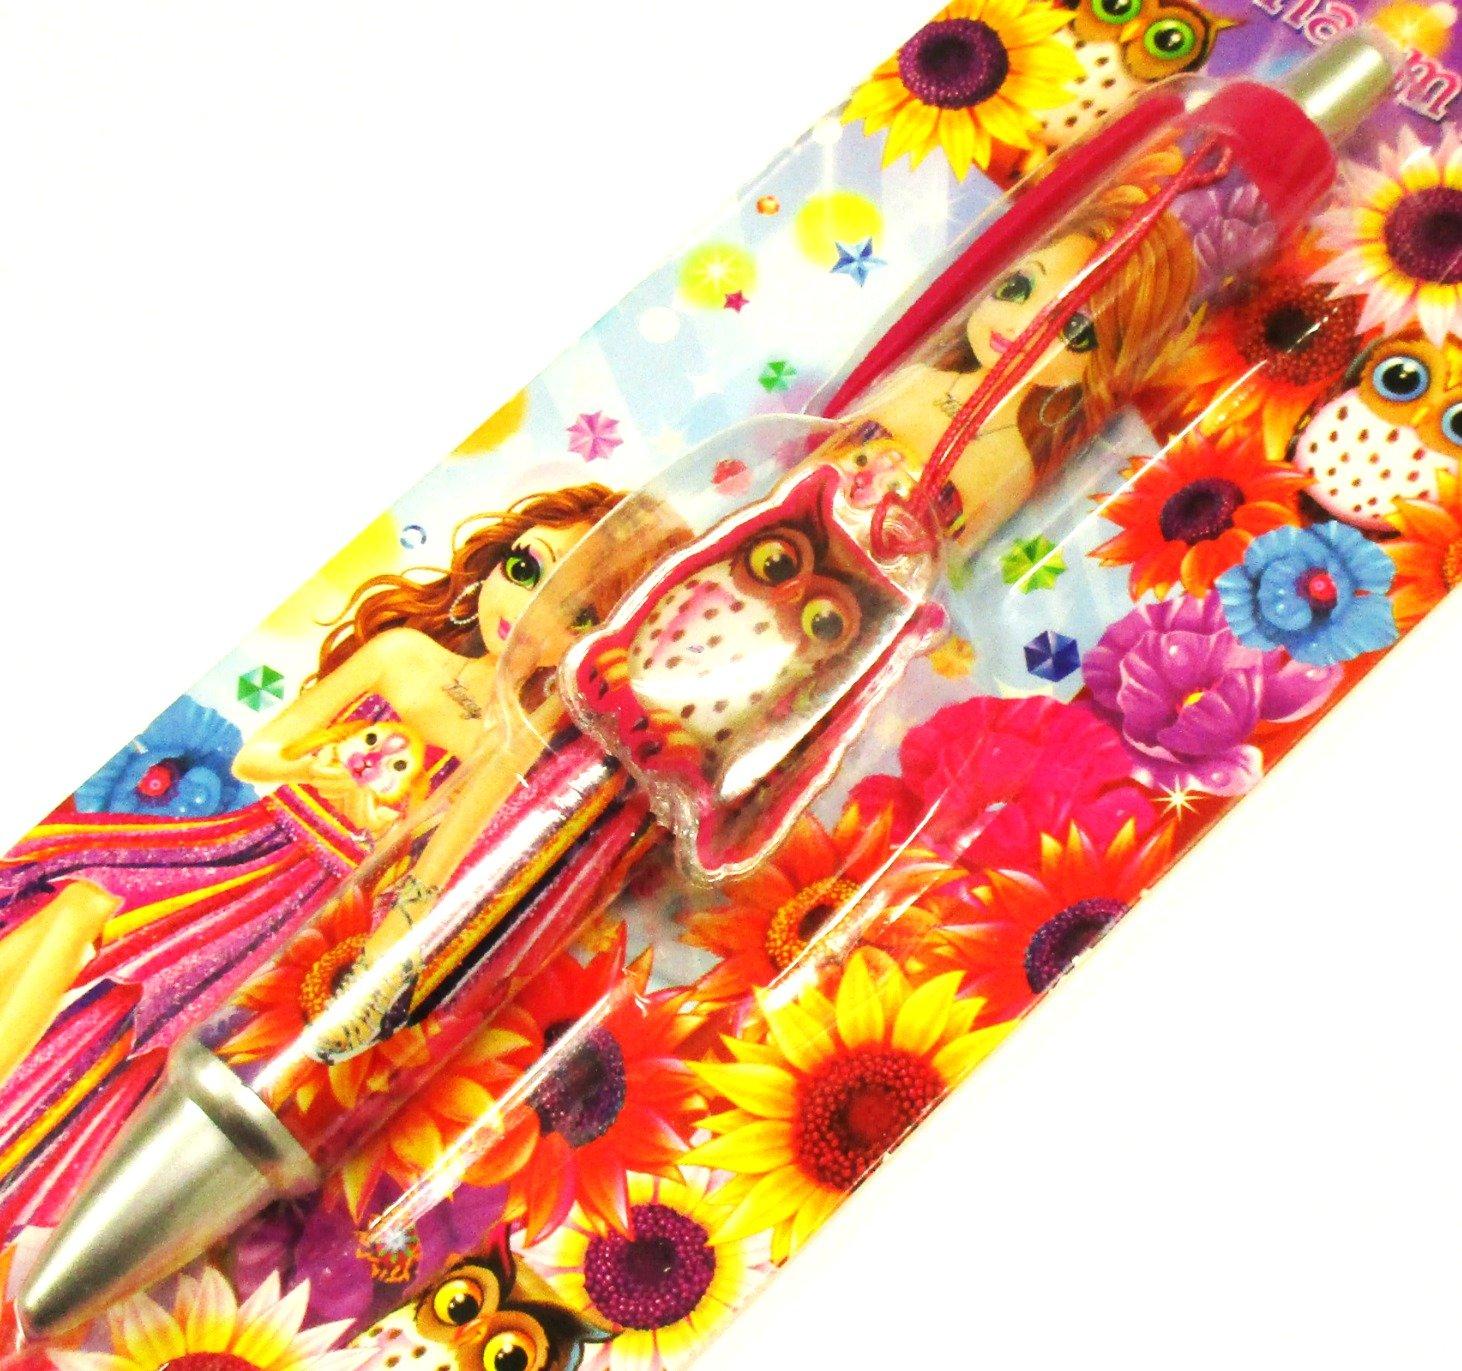 Lisa Frank Owl & Sunflower Daisy Bunny Rabbit Girl Dangle Charm Retractable Ball Point Ink Pen